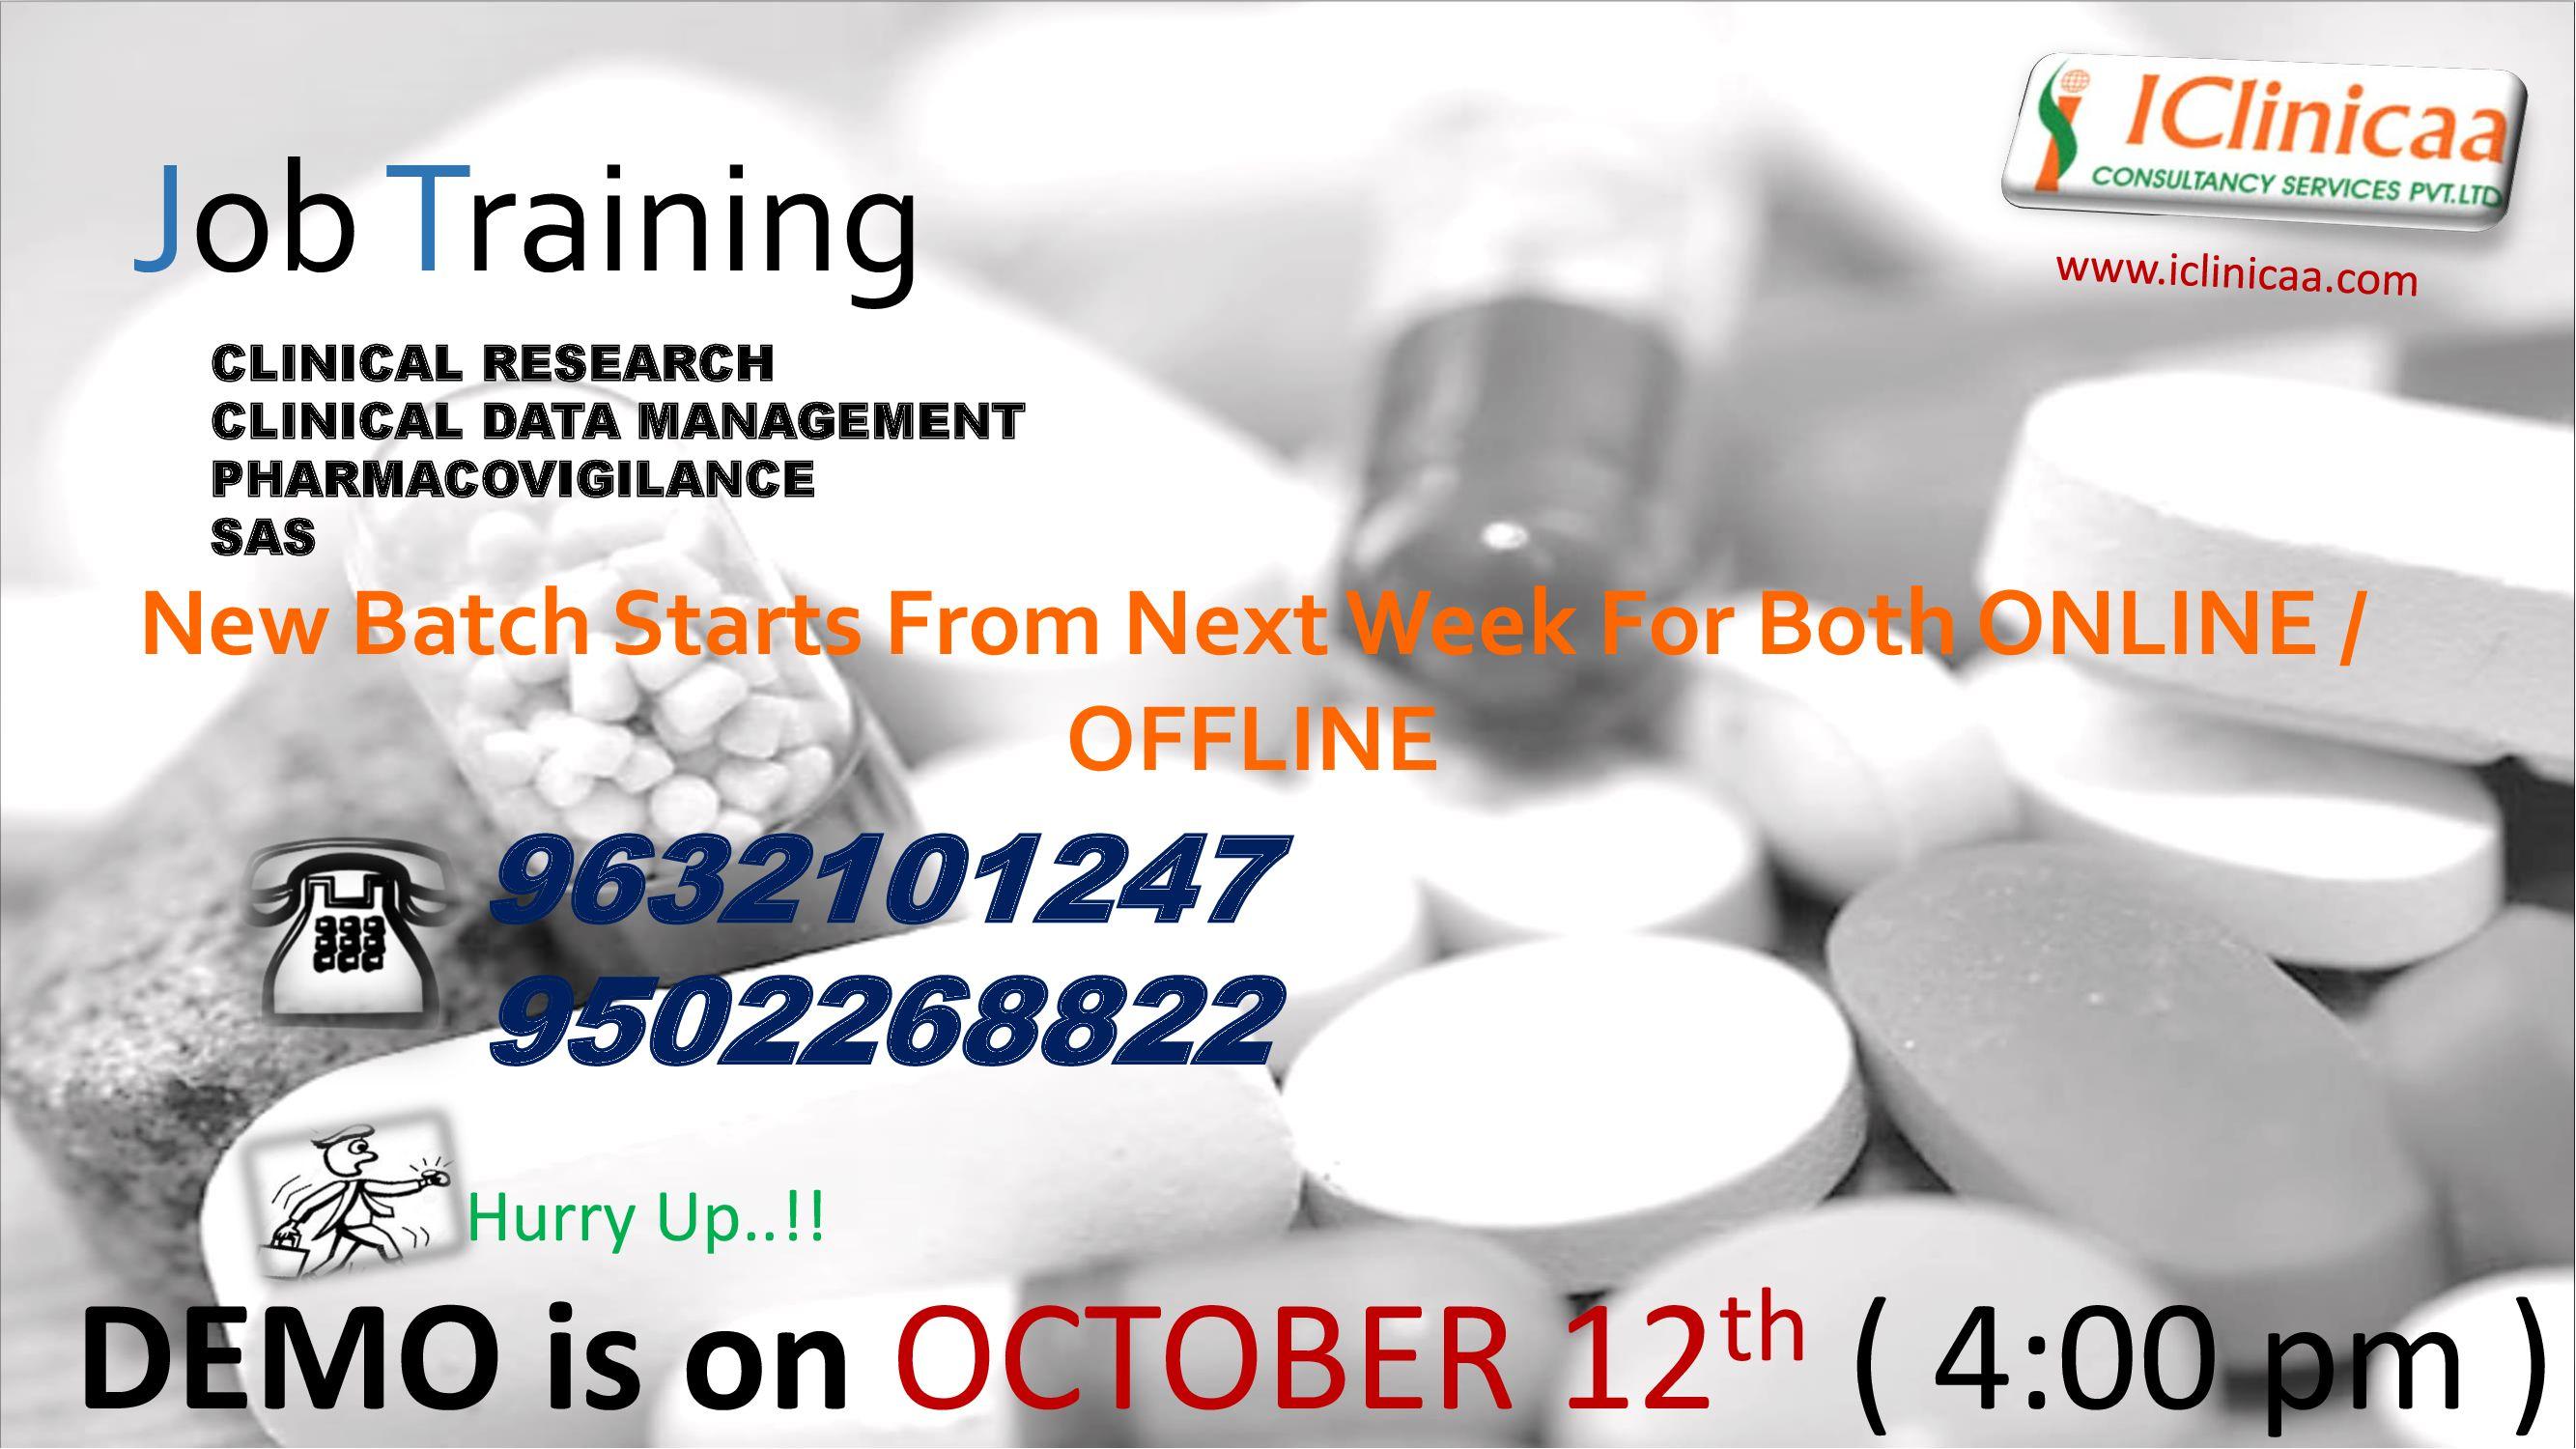 Pin by training academy on iclinicaa training and